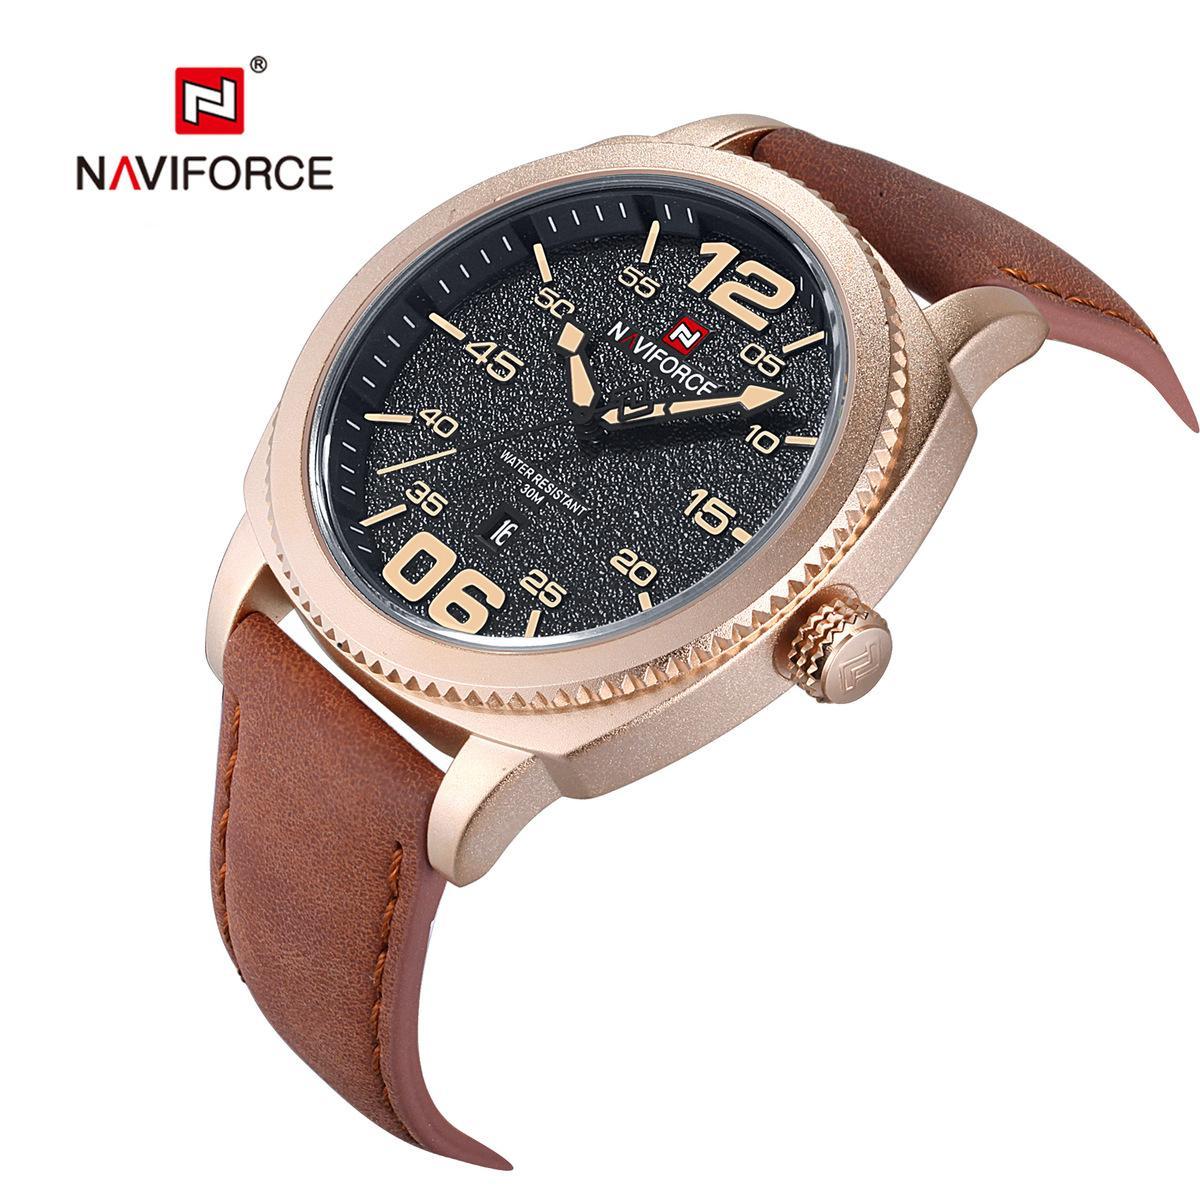 2018 New Pattern Man Wrist Watches Lead Waterproof Quartz Fashion Wrist  Watch Luxury Brand Mens Watches For Shock Men Hot Sale Cheap Luxury Watches  Cheap ...